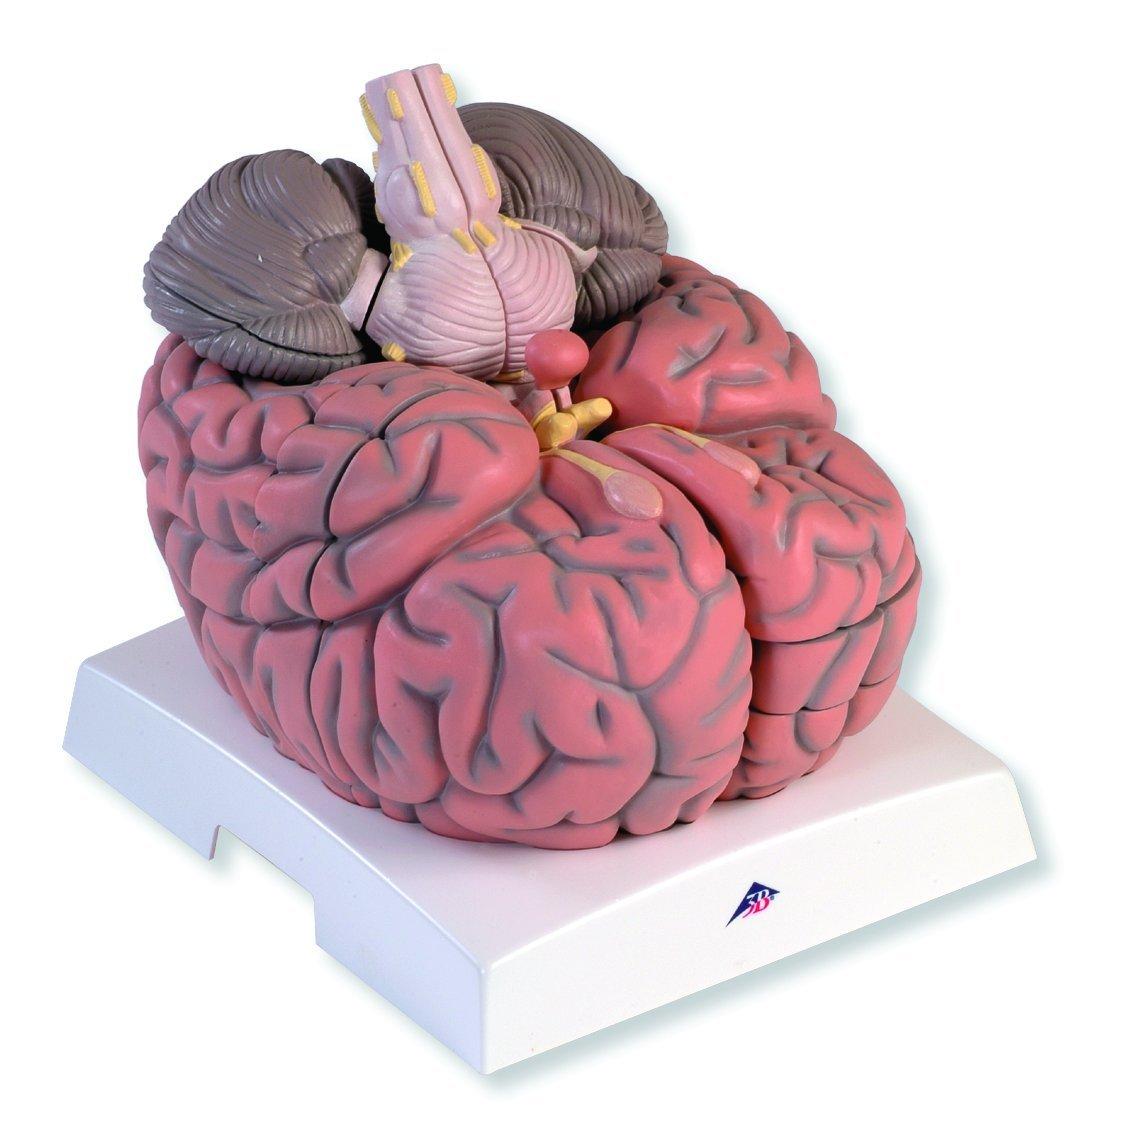 3B Scientific VH409 14 Part Giant Brain Model, 2.5 Times Full-Size ...